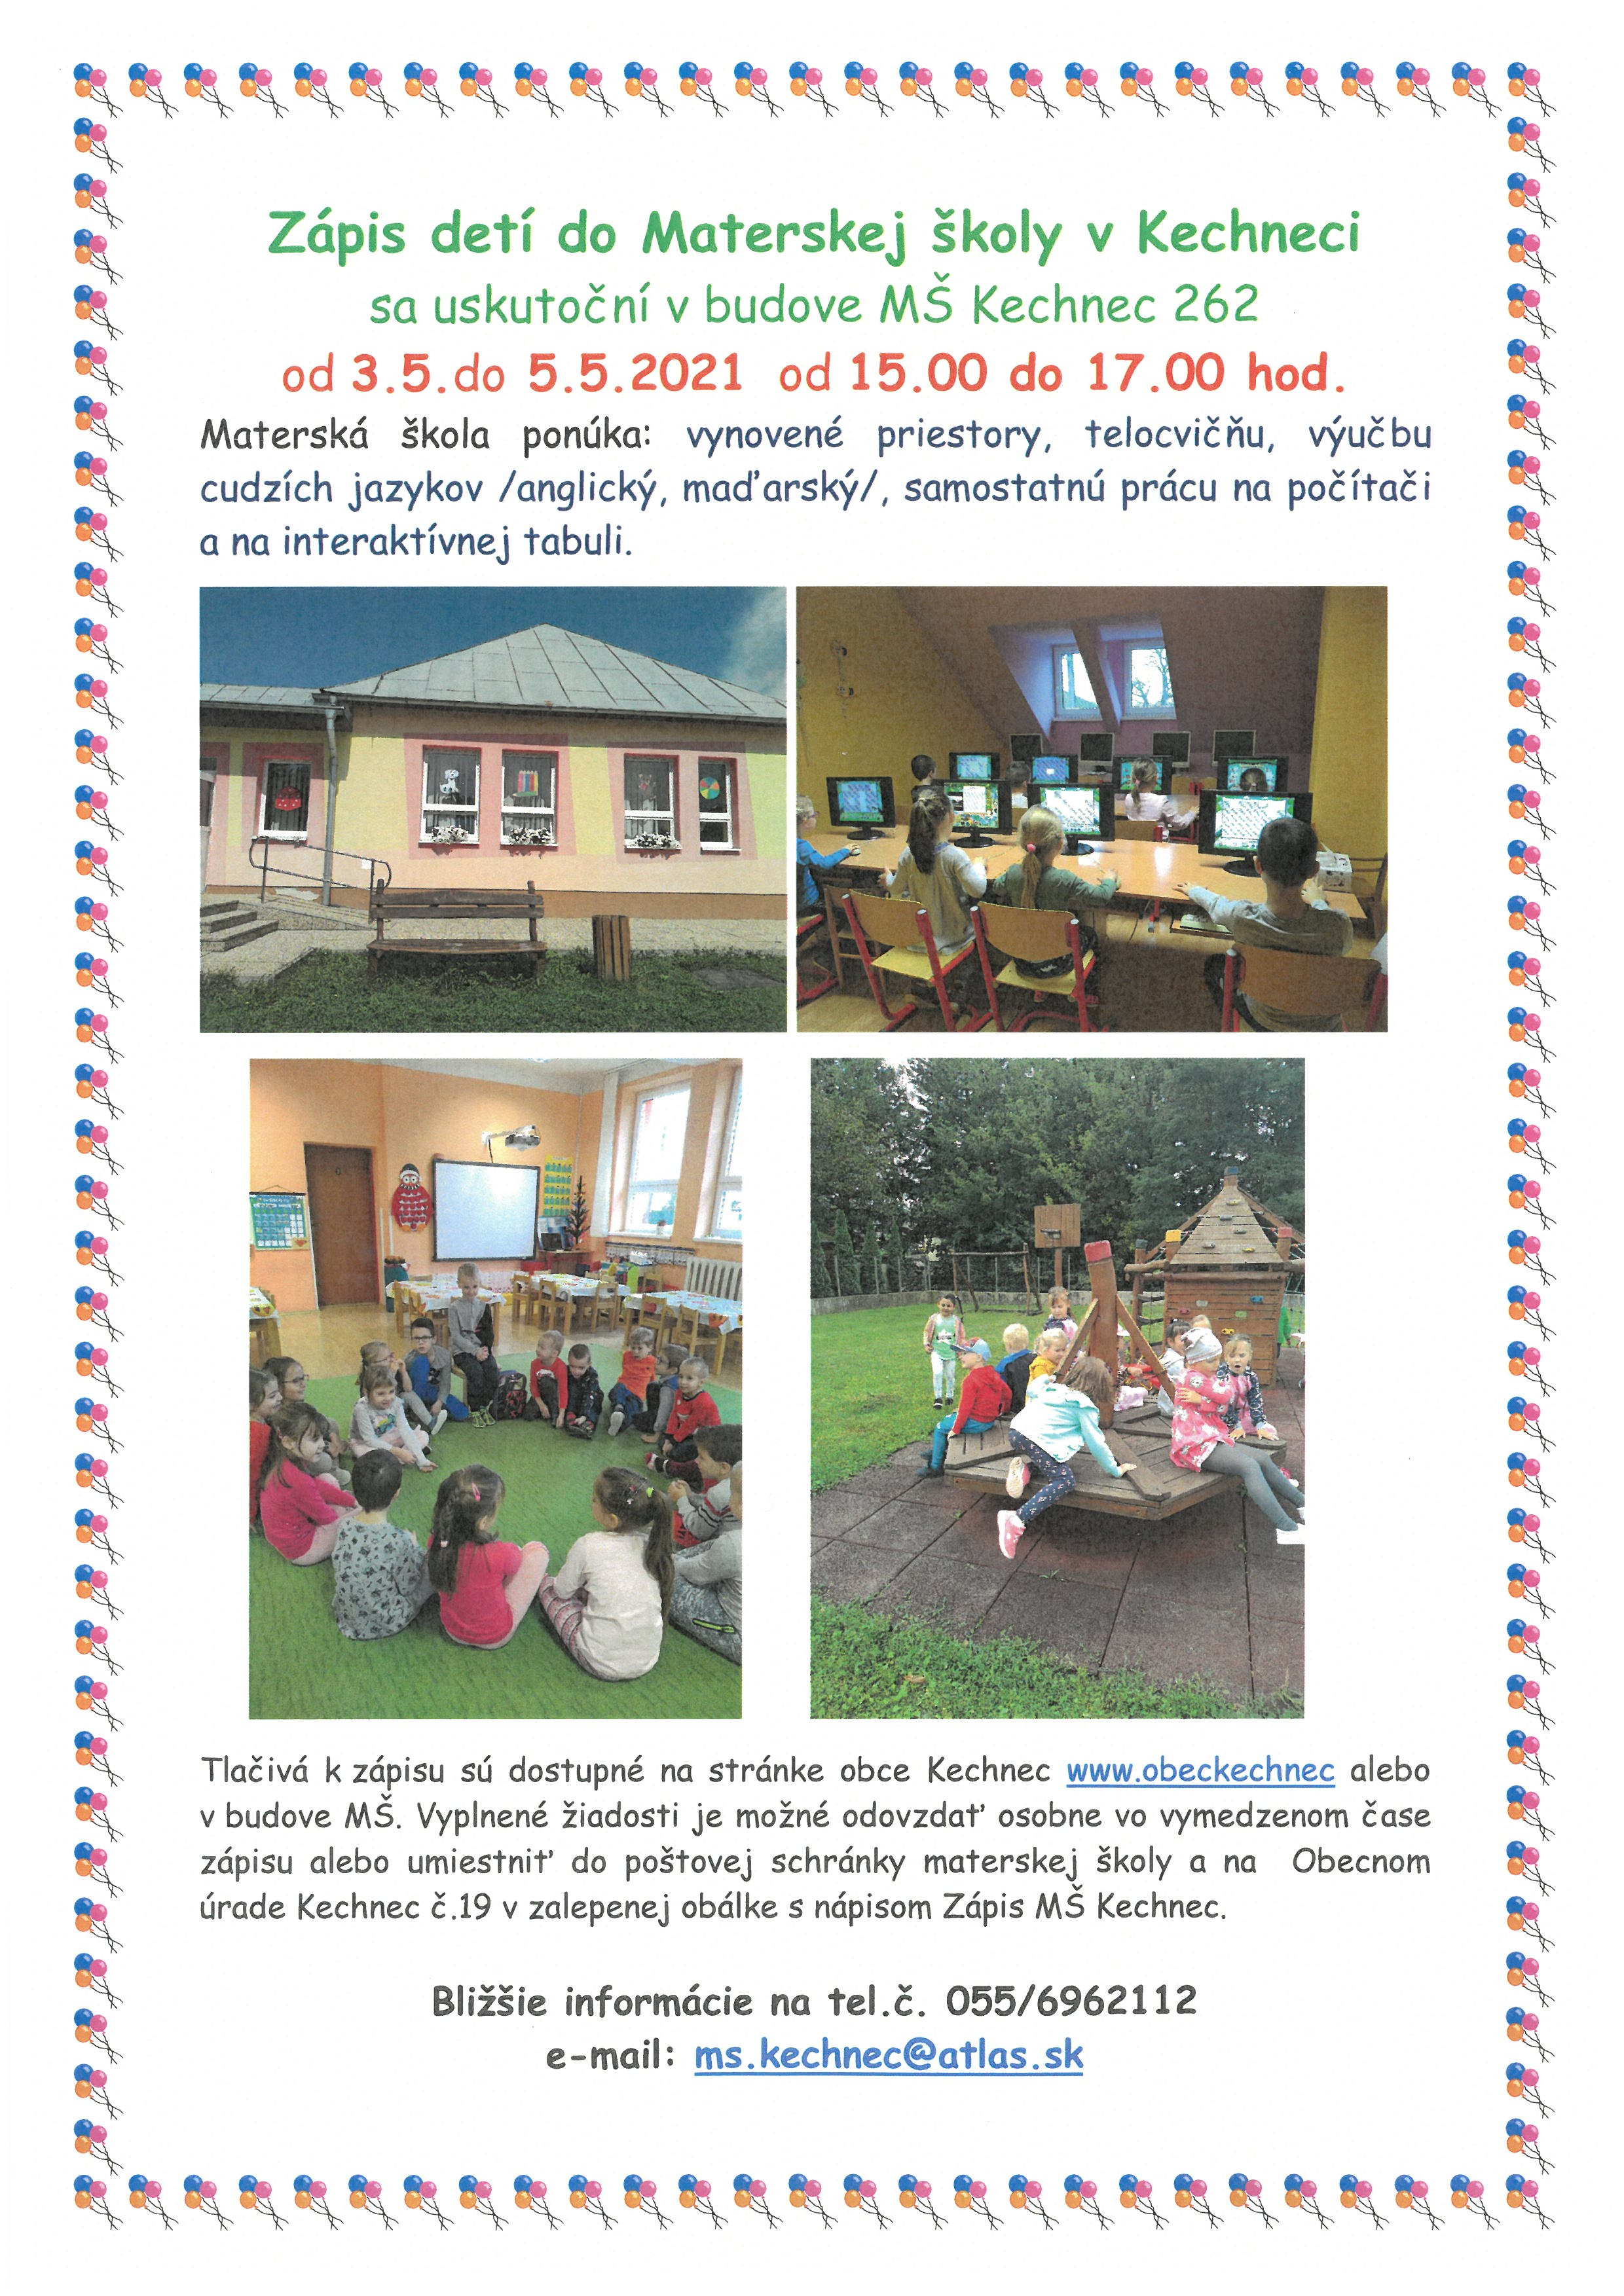 Zápis detí do Materskej školy Kechnec